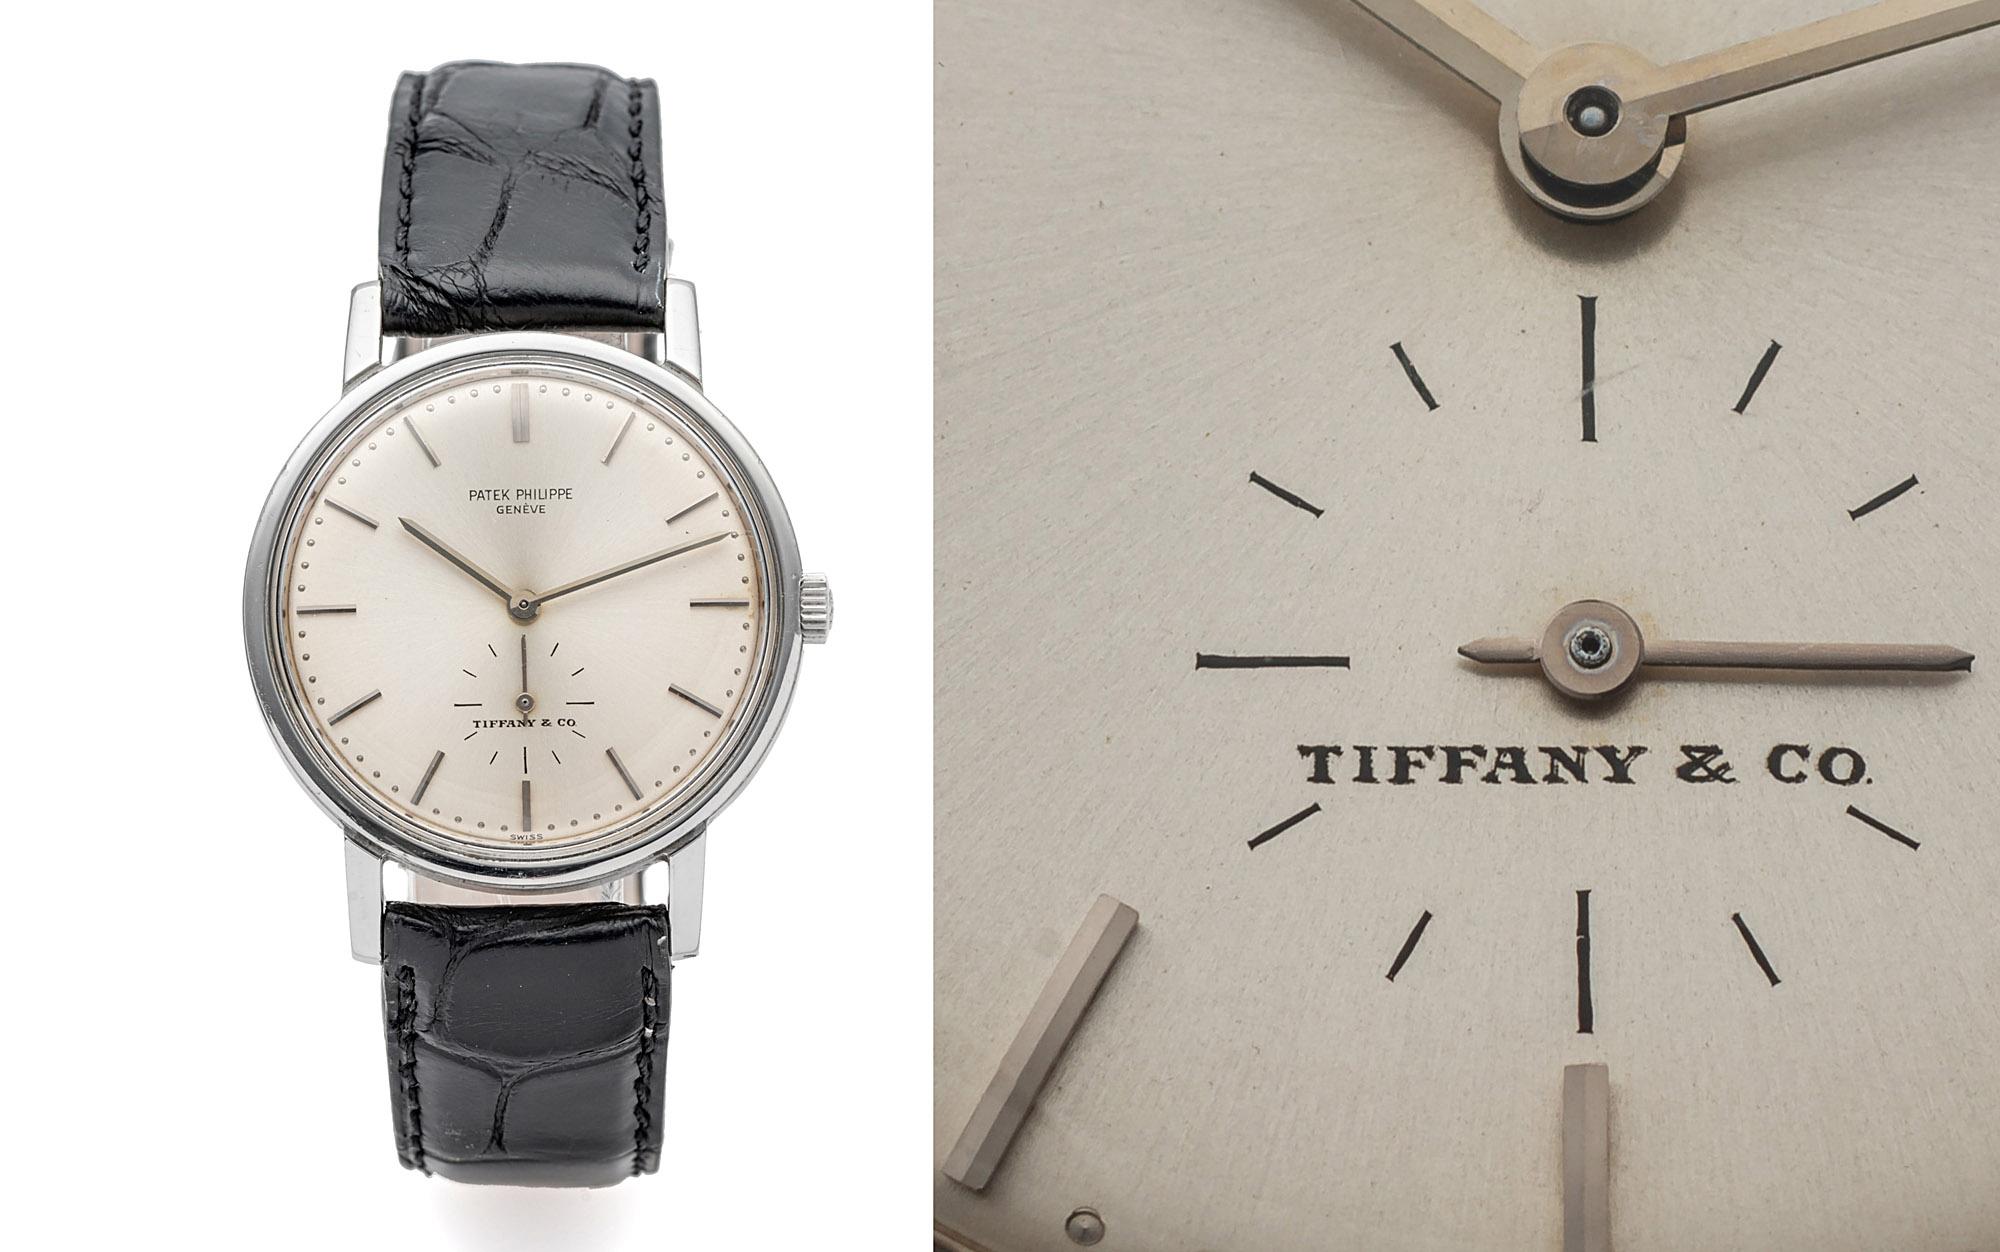 Patek Philippe Ref. 3466, signed Tiffany